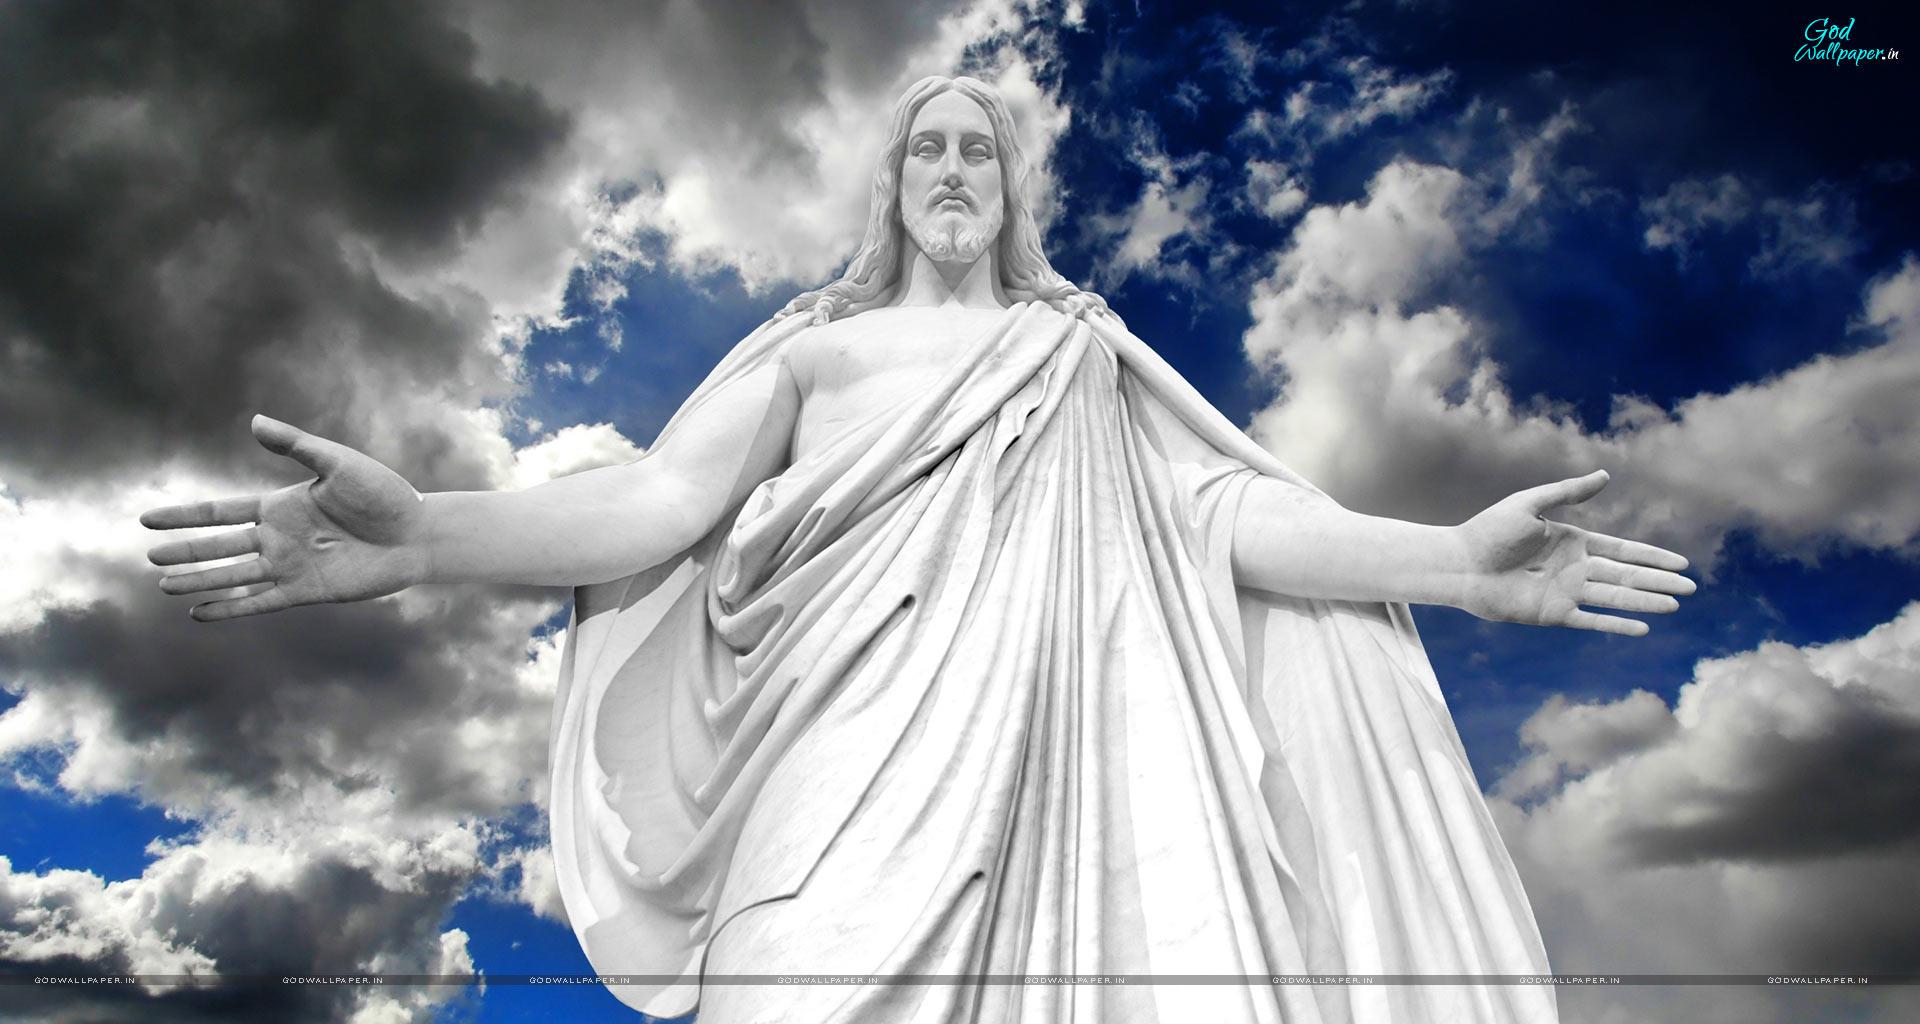 Free Christian Wallpaper For Cell Phones: Jesus Phone Wallpaper